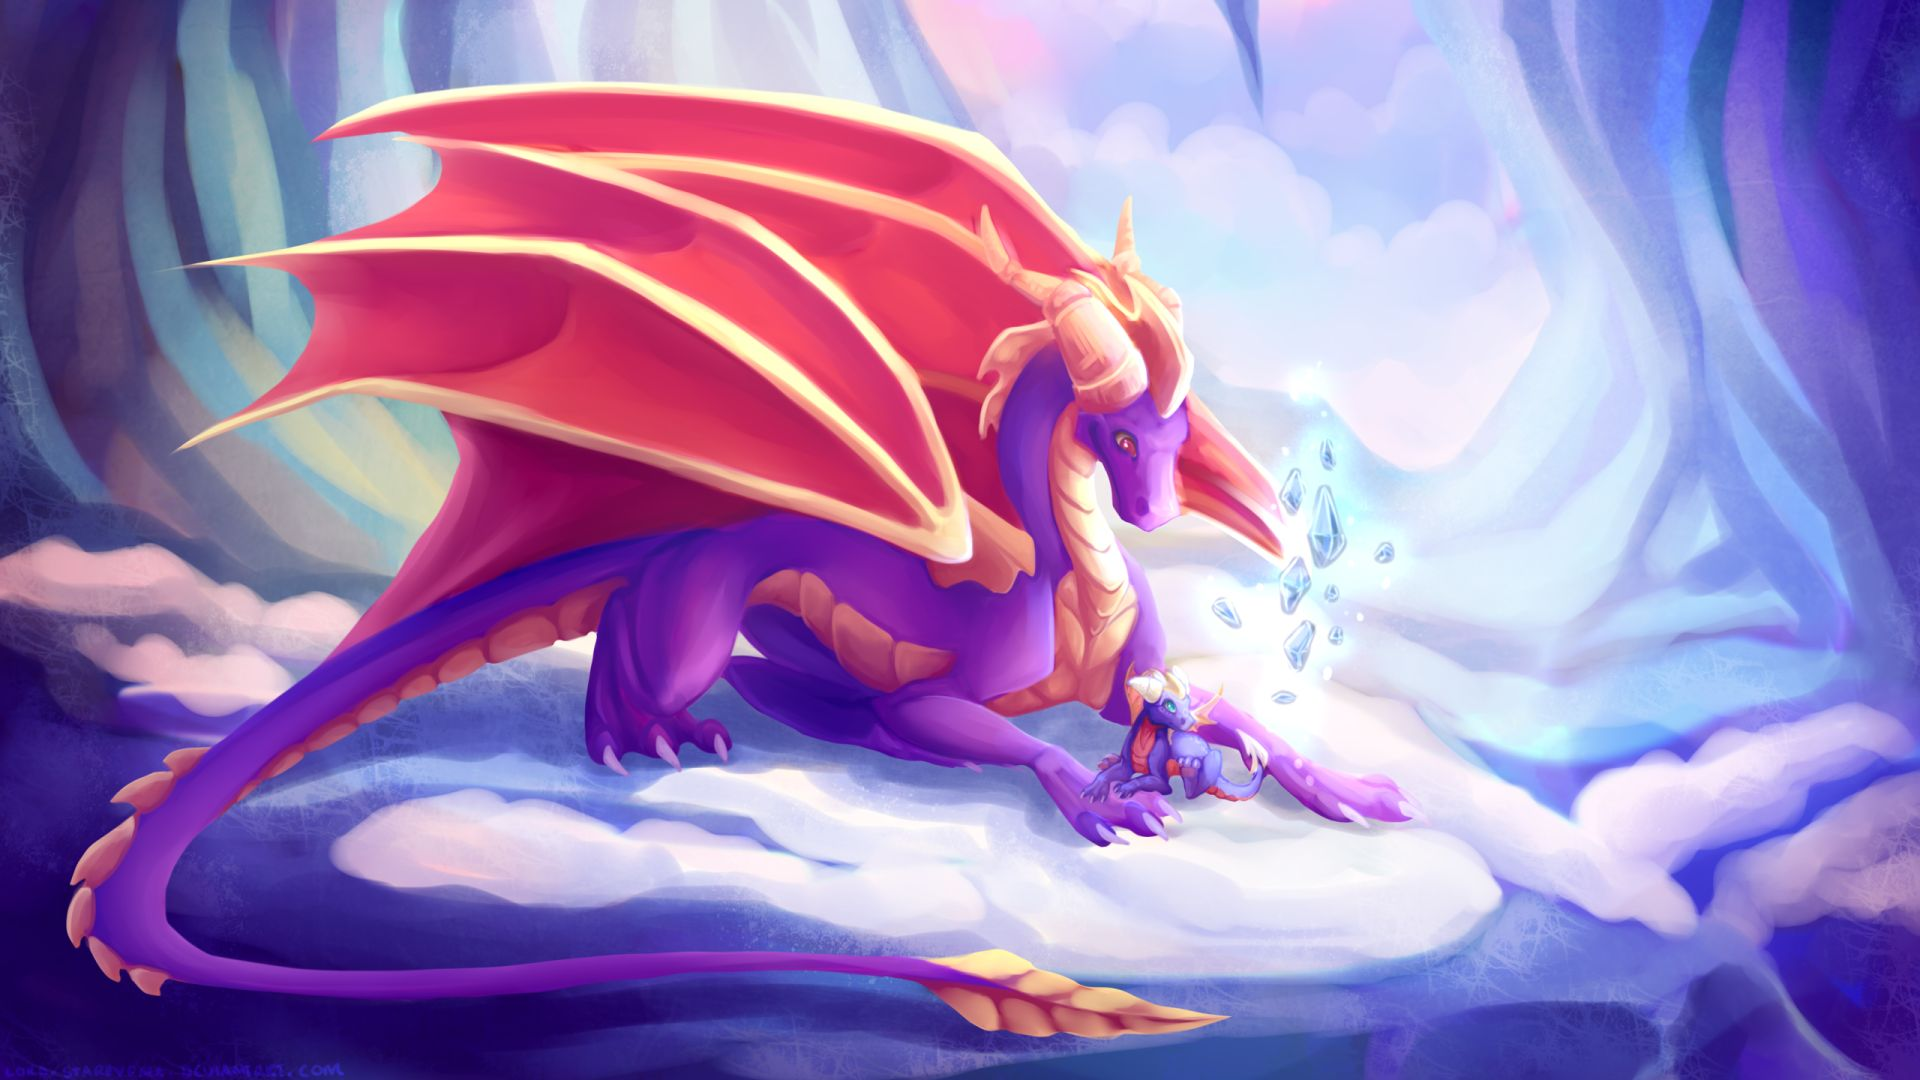 cute dragon art image hd